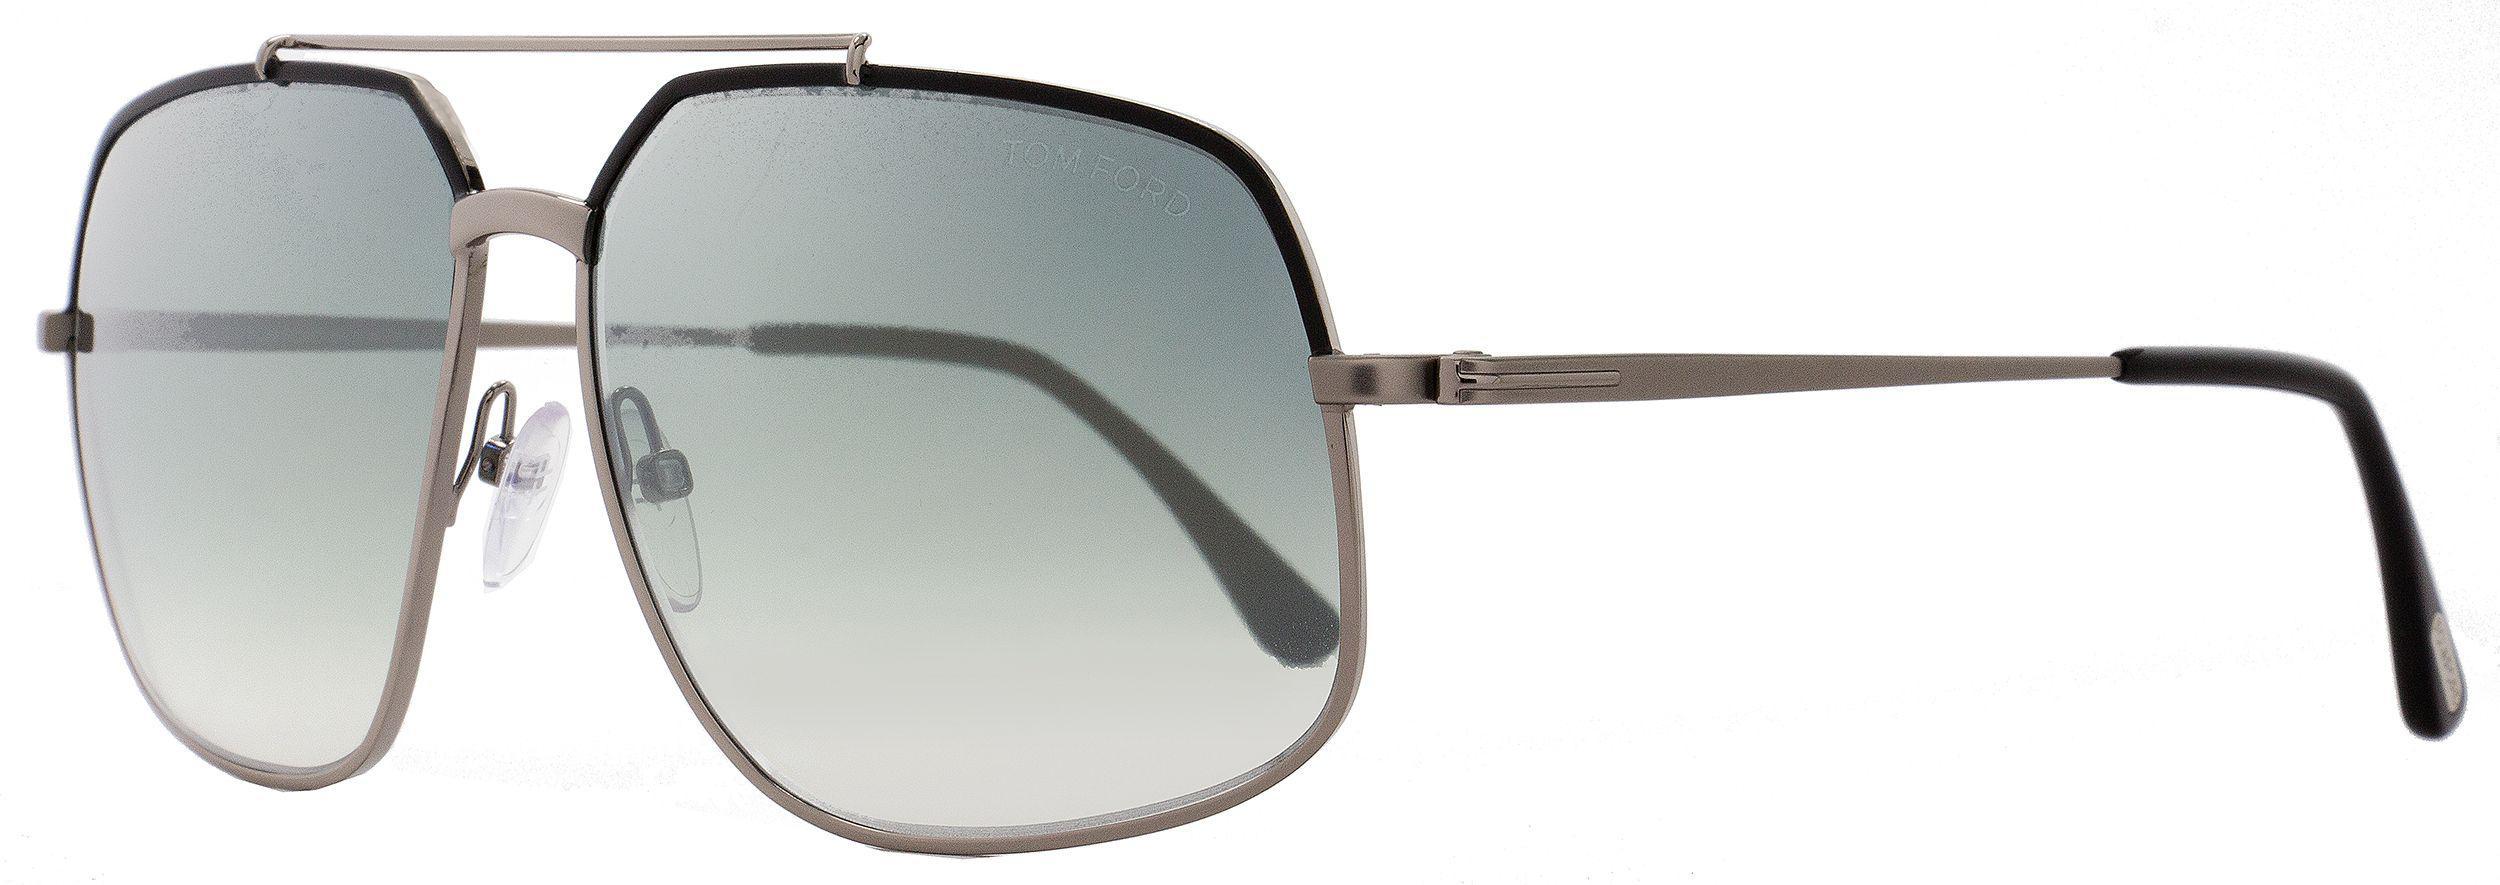 Lyst - Tom Ford Aviator Sunglasses Tf439 Ronnie 01q Gunmetal black ... 88c5f67e802c